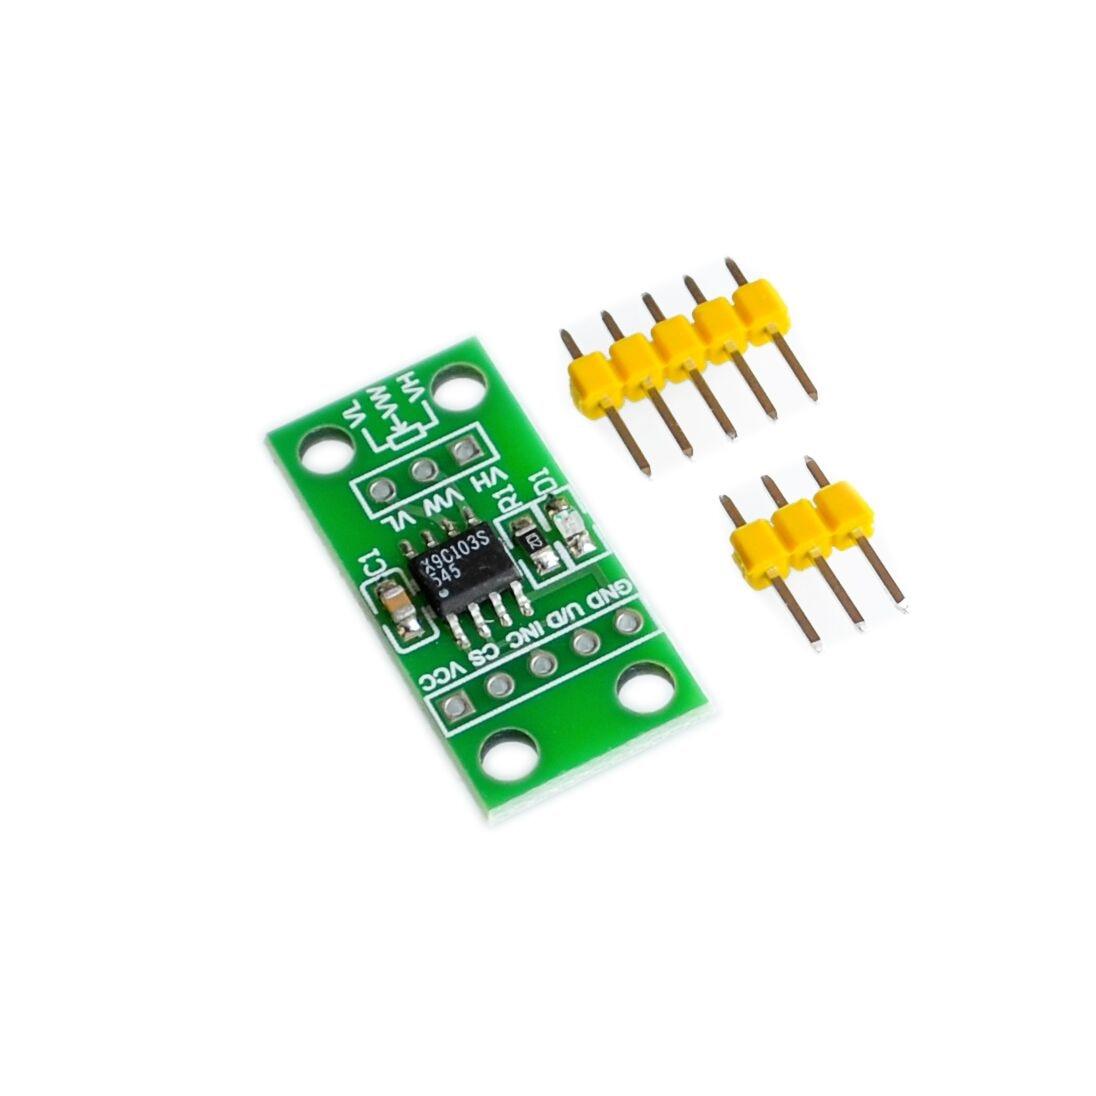 X9c104 Digital Potentiometer Module For Arduino Board Copper Clad Boards 10x15cm 100x150x12mm High Quality Circuit Pcb X9c103s Dc3v 5v